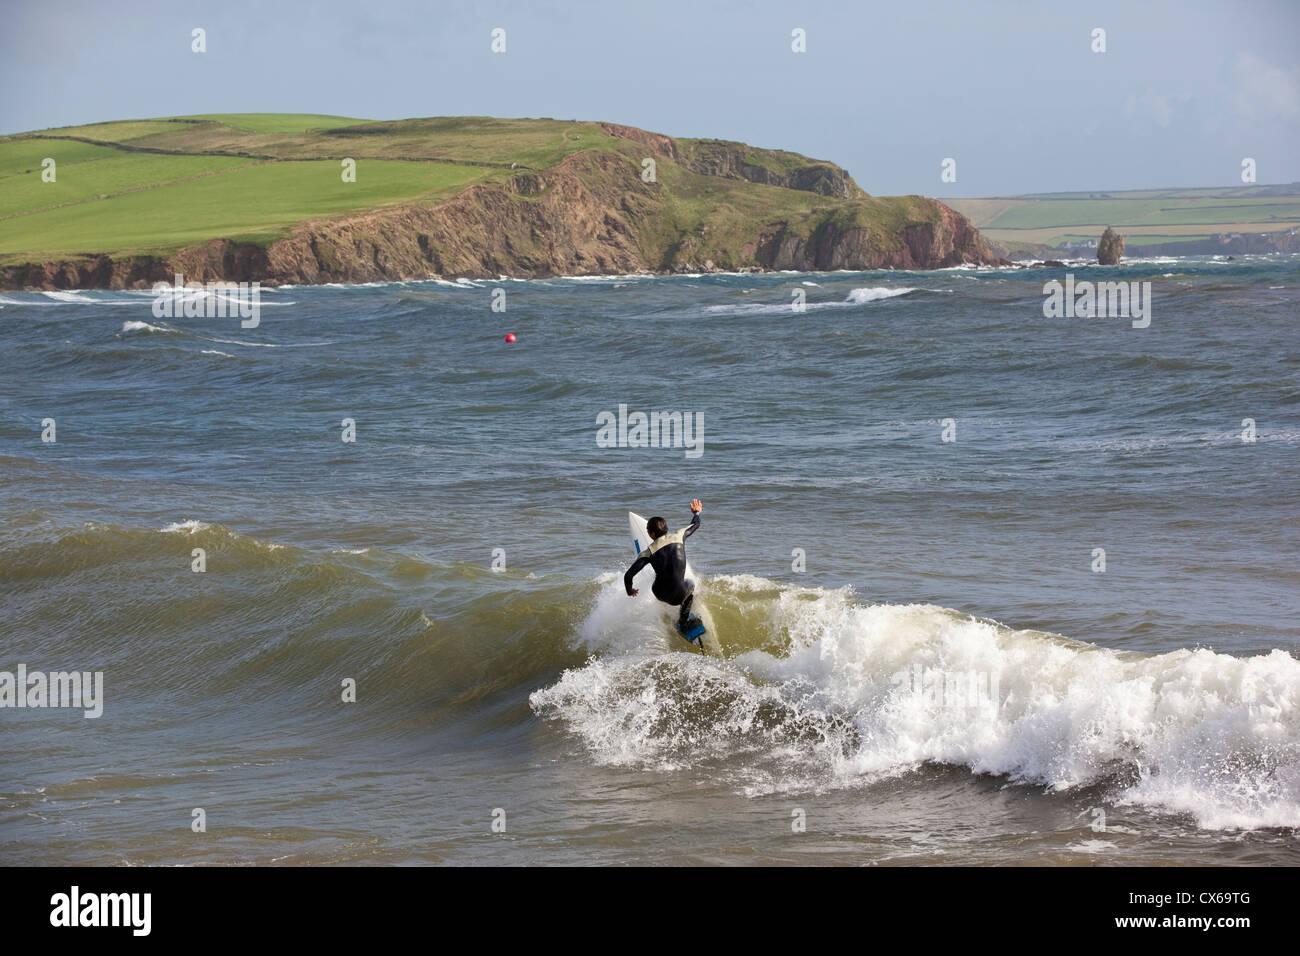 Surfer at Bigbury-On-Sea on the south coast of Devon, South Hams, England, UK - Stock Image